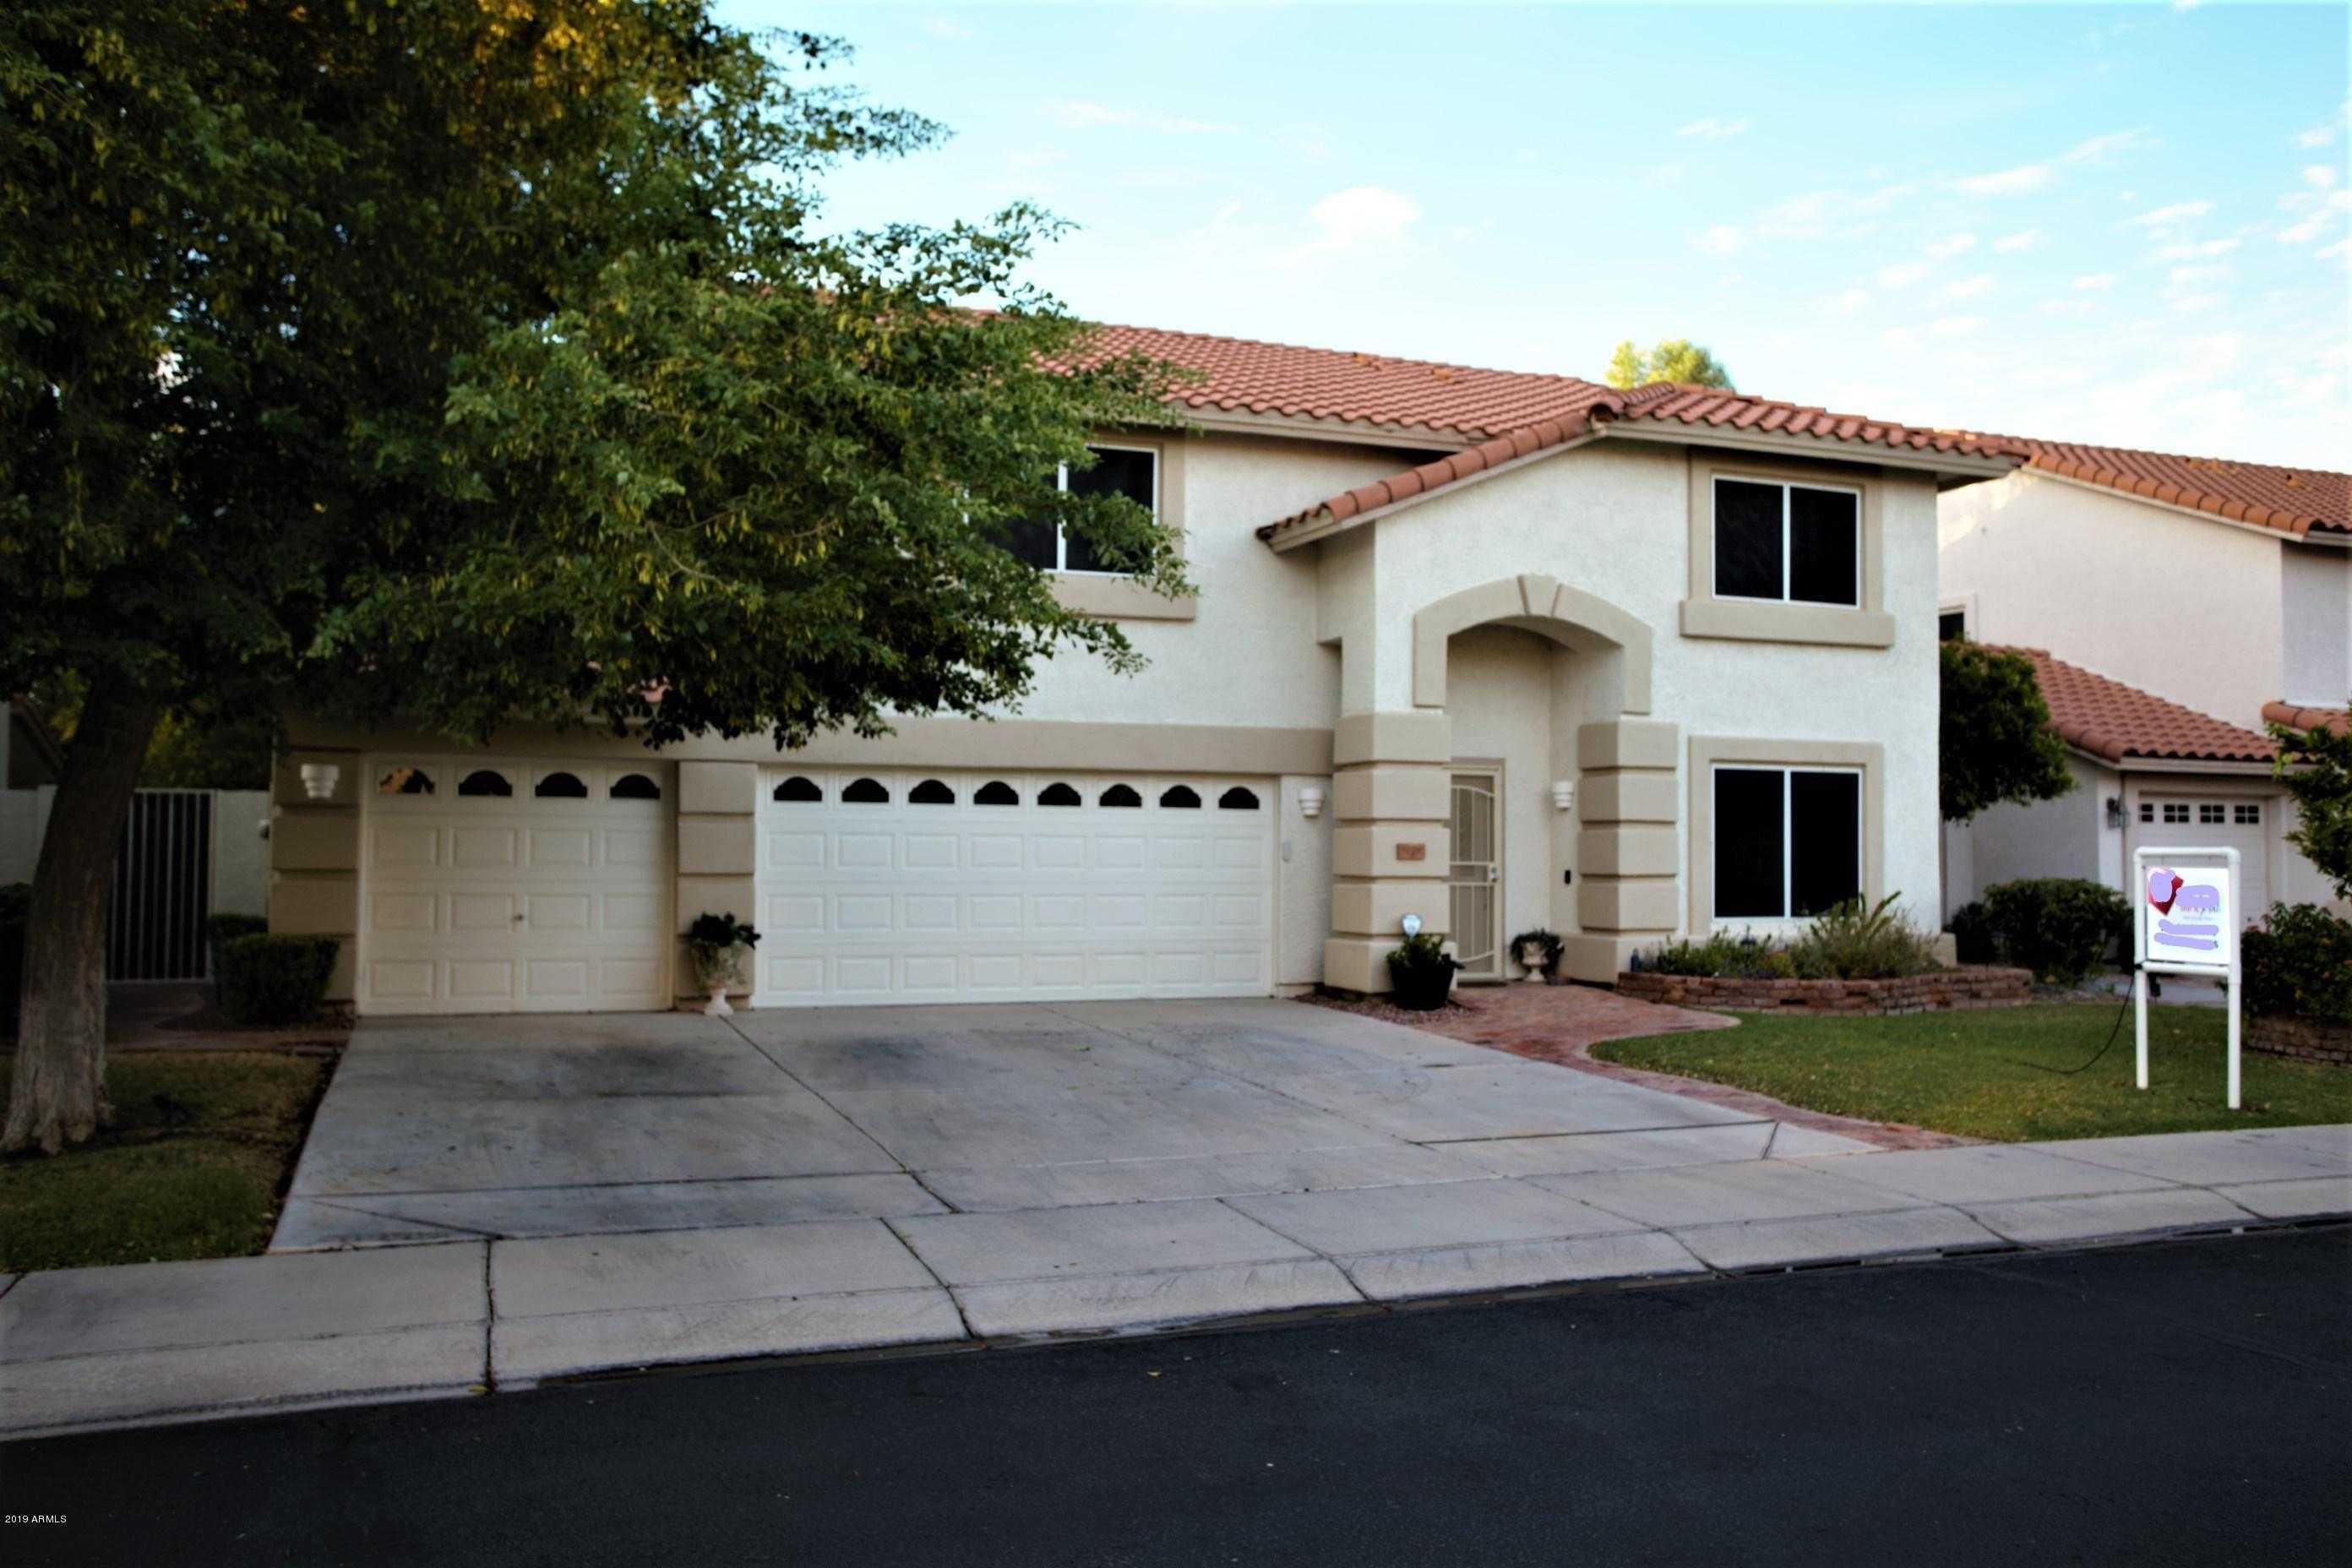 $374,990 - 5Br/3Ba - Home for Sale in Mission Groves 4 & 5, Glendale